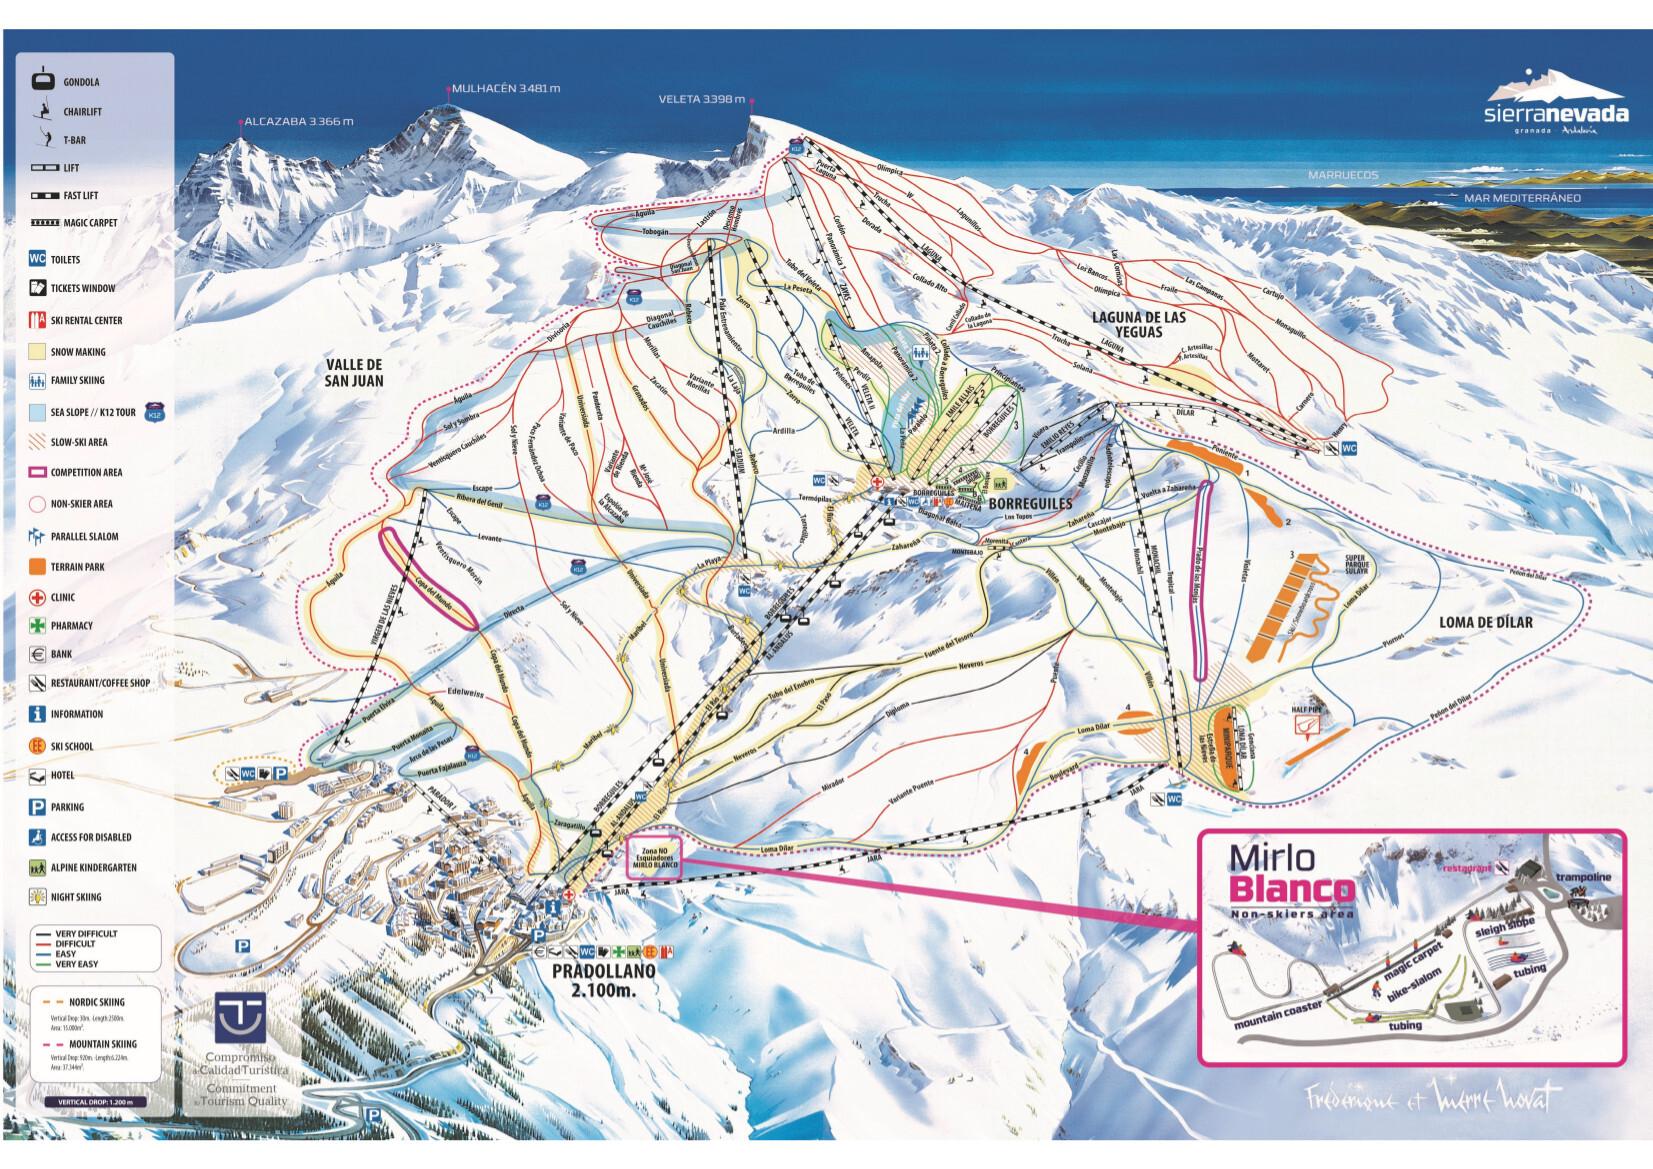 serra nevada mapa Sierra Nevada Piste Map / Trail Map serra nevada mapa